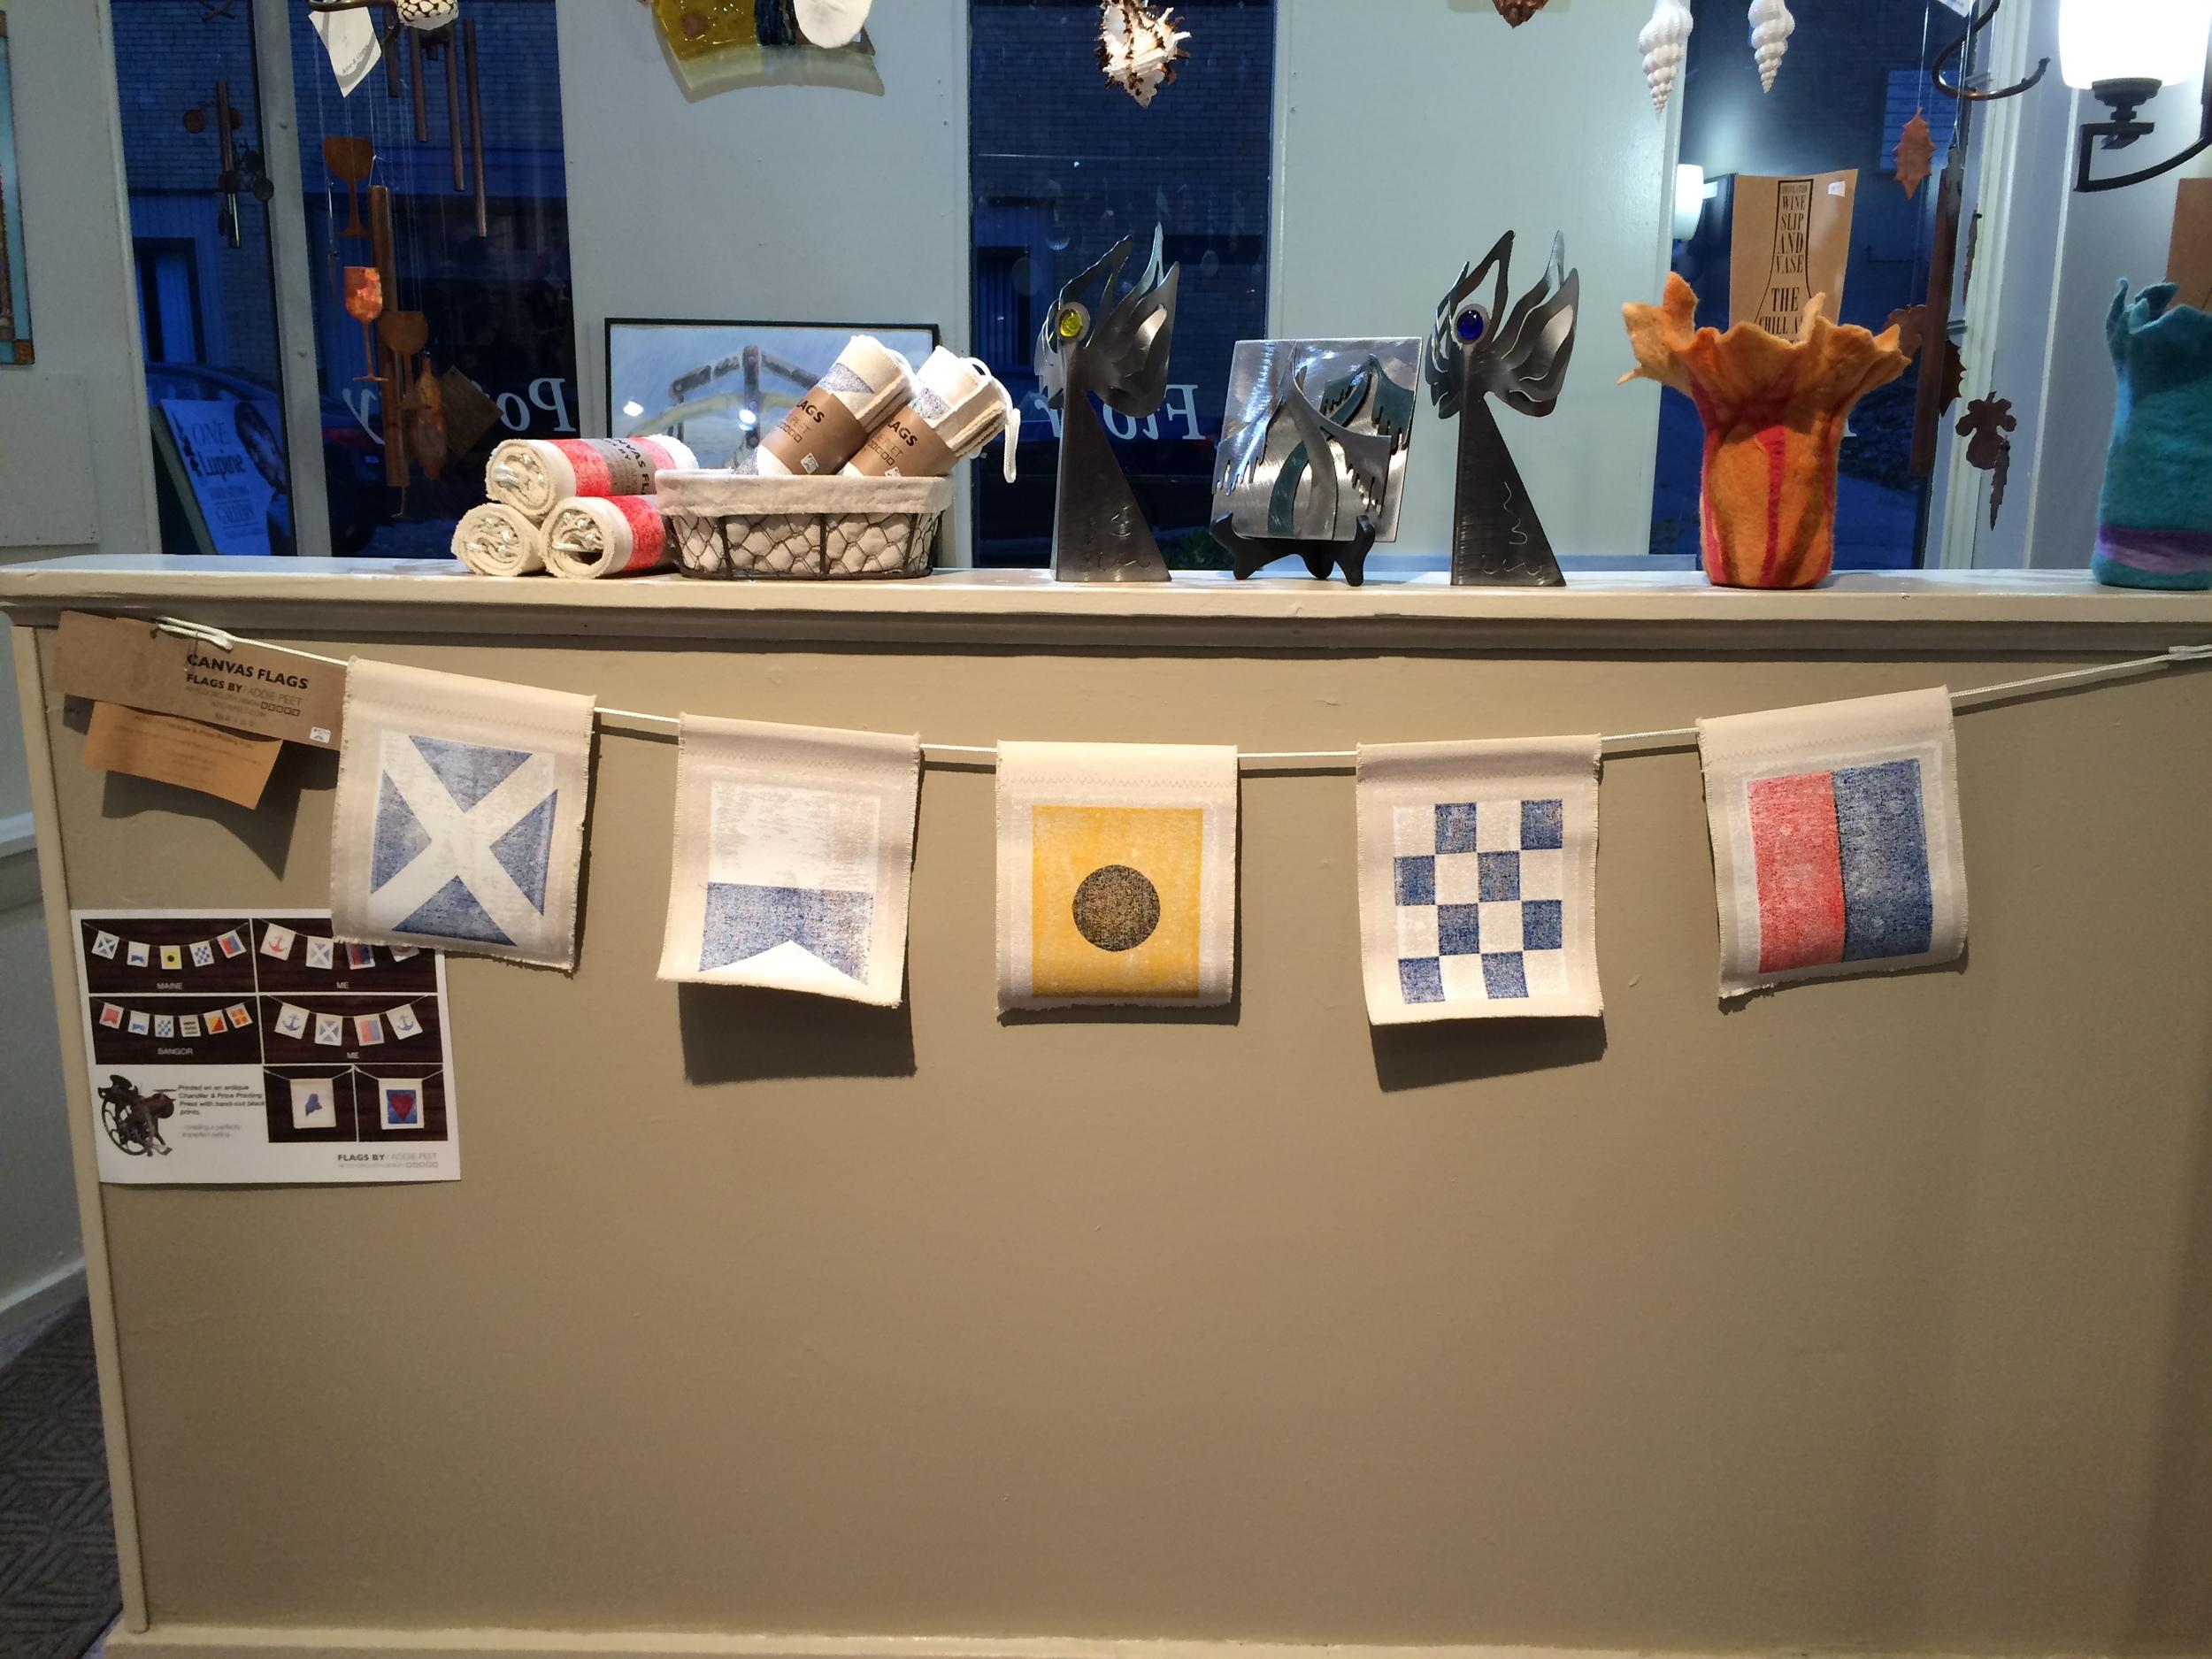 nautical signal flags by addie peet (this one spells m-a-i-n-e)